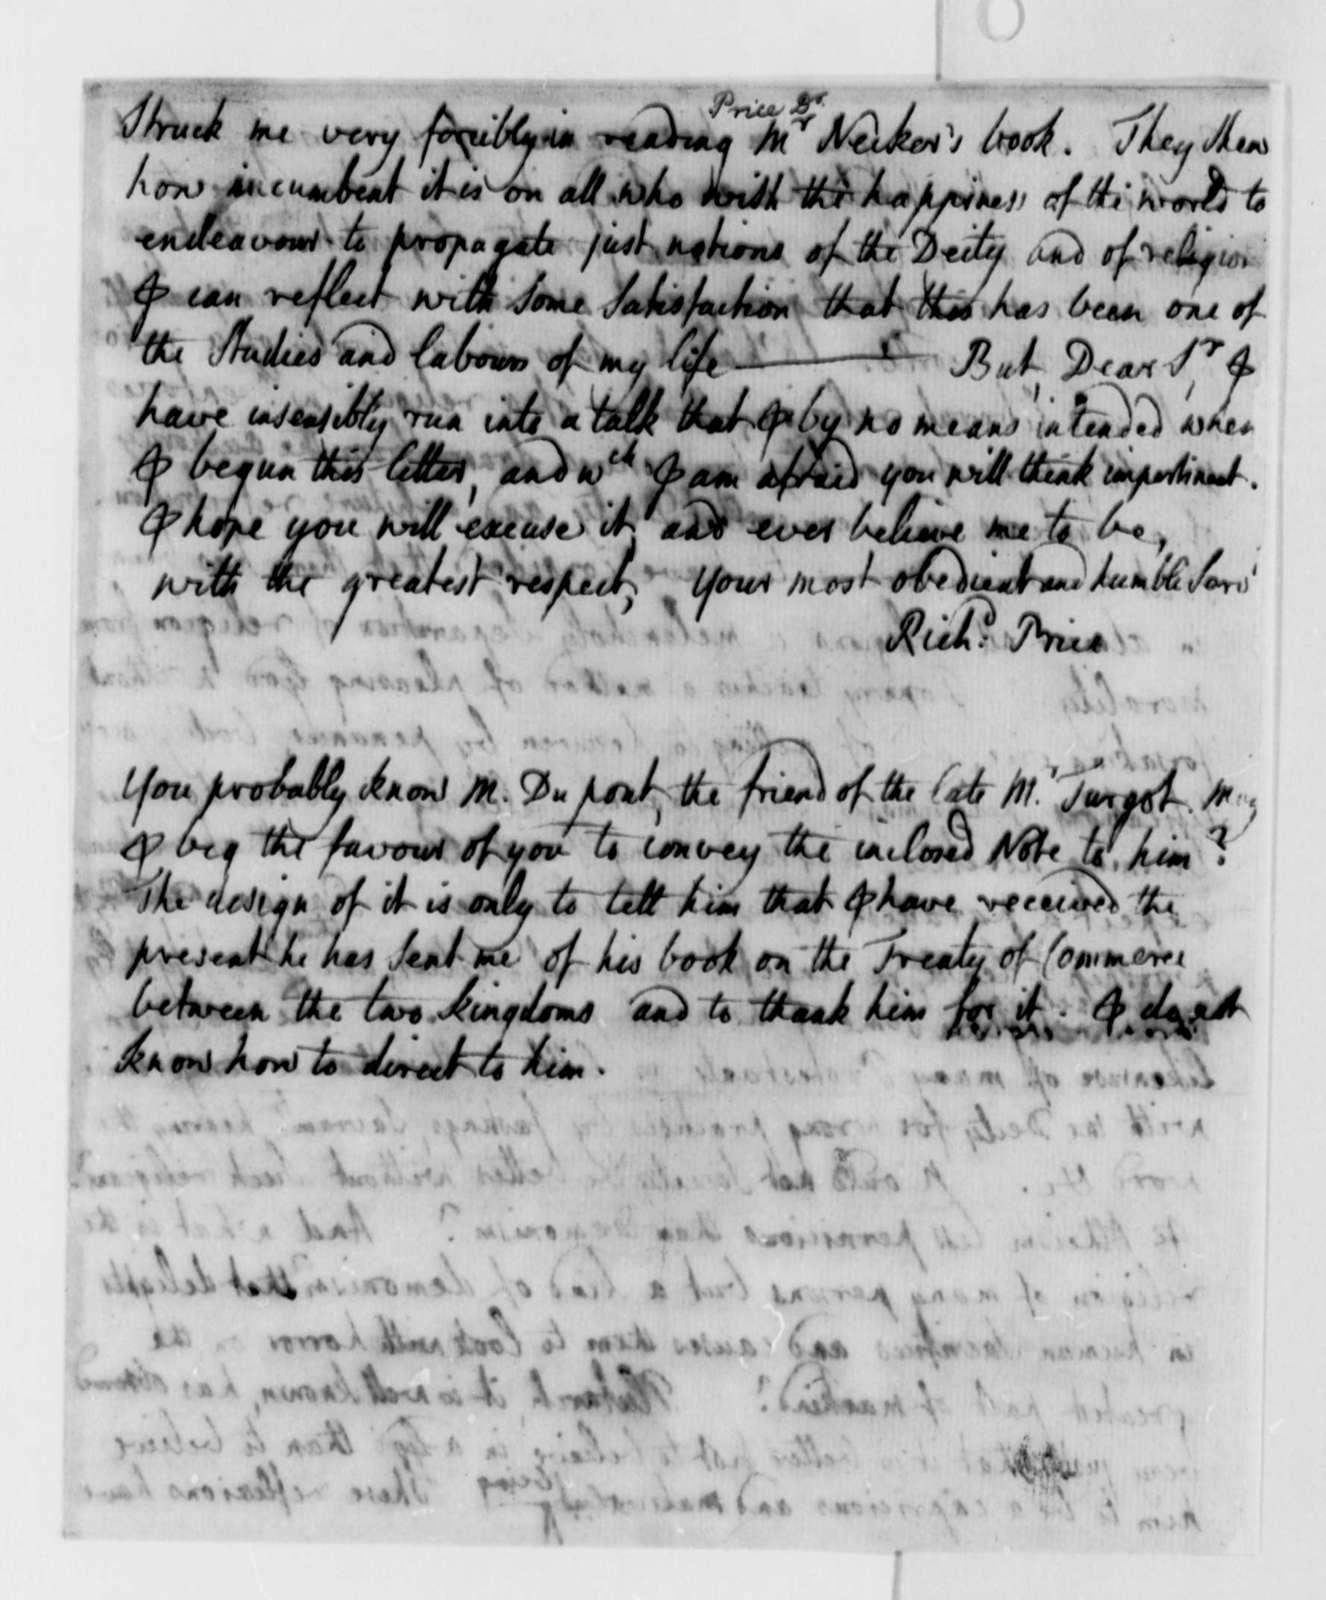 Richard Price to Thomas Jefferson, October 26, 1788